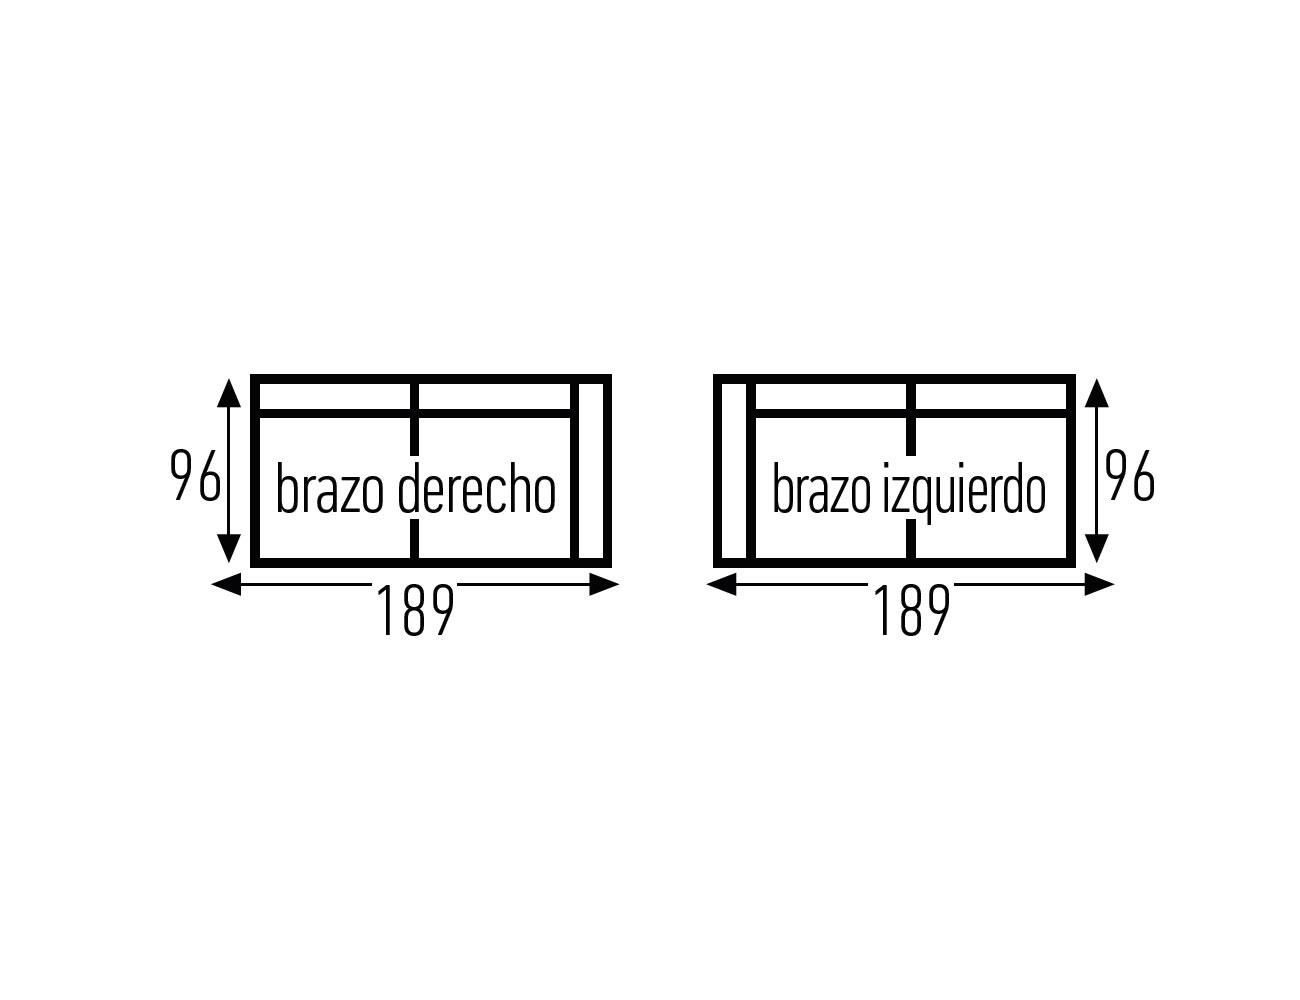 Croquis 3p sin 1 brazo 18915